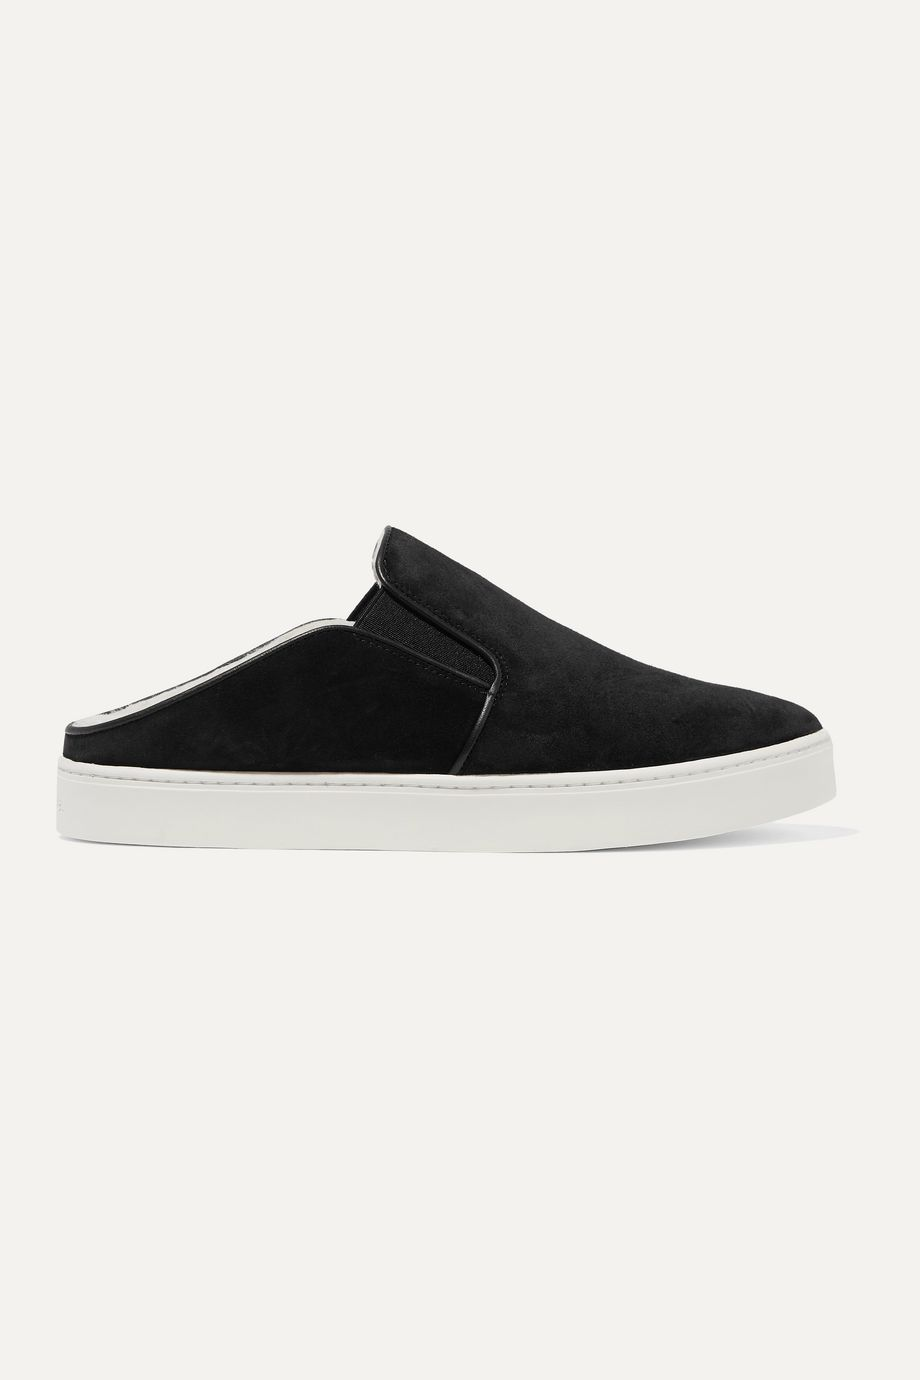 Vince Garvey shearling-lined suede sneakers